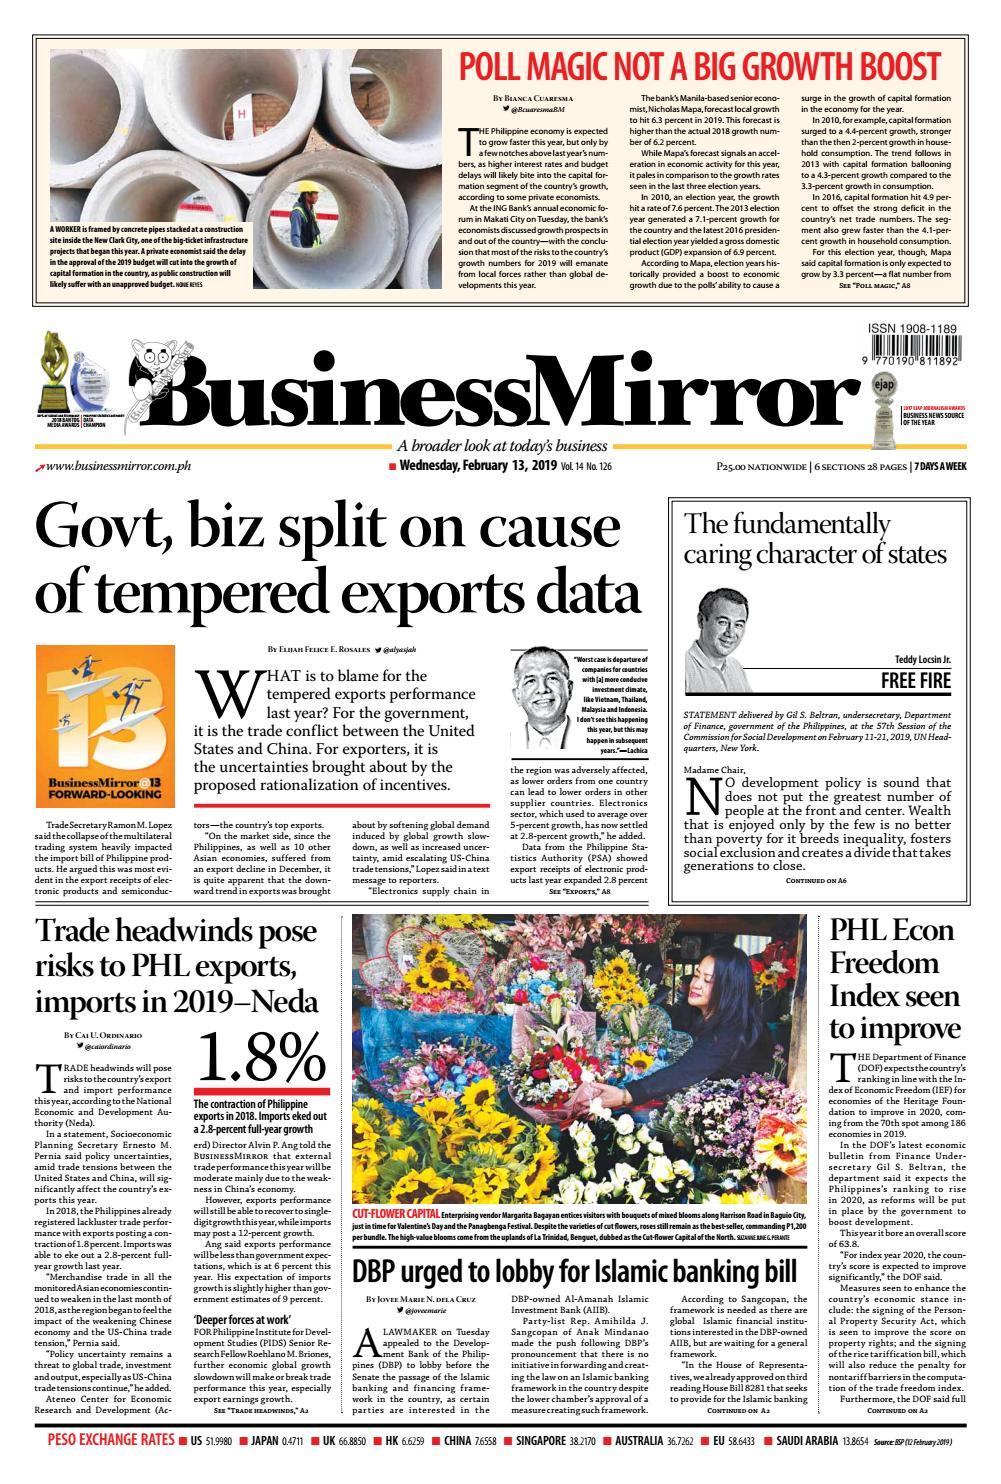 BusinessMirror February 13, 2019 by BusinessMirror - issuu